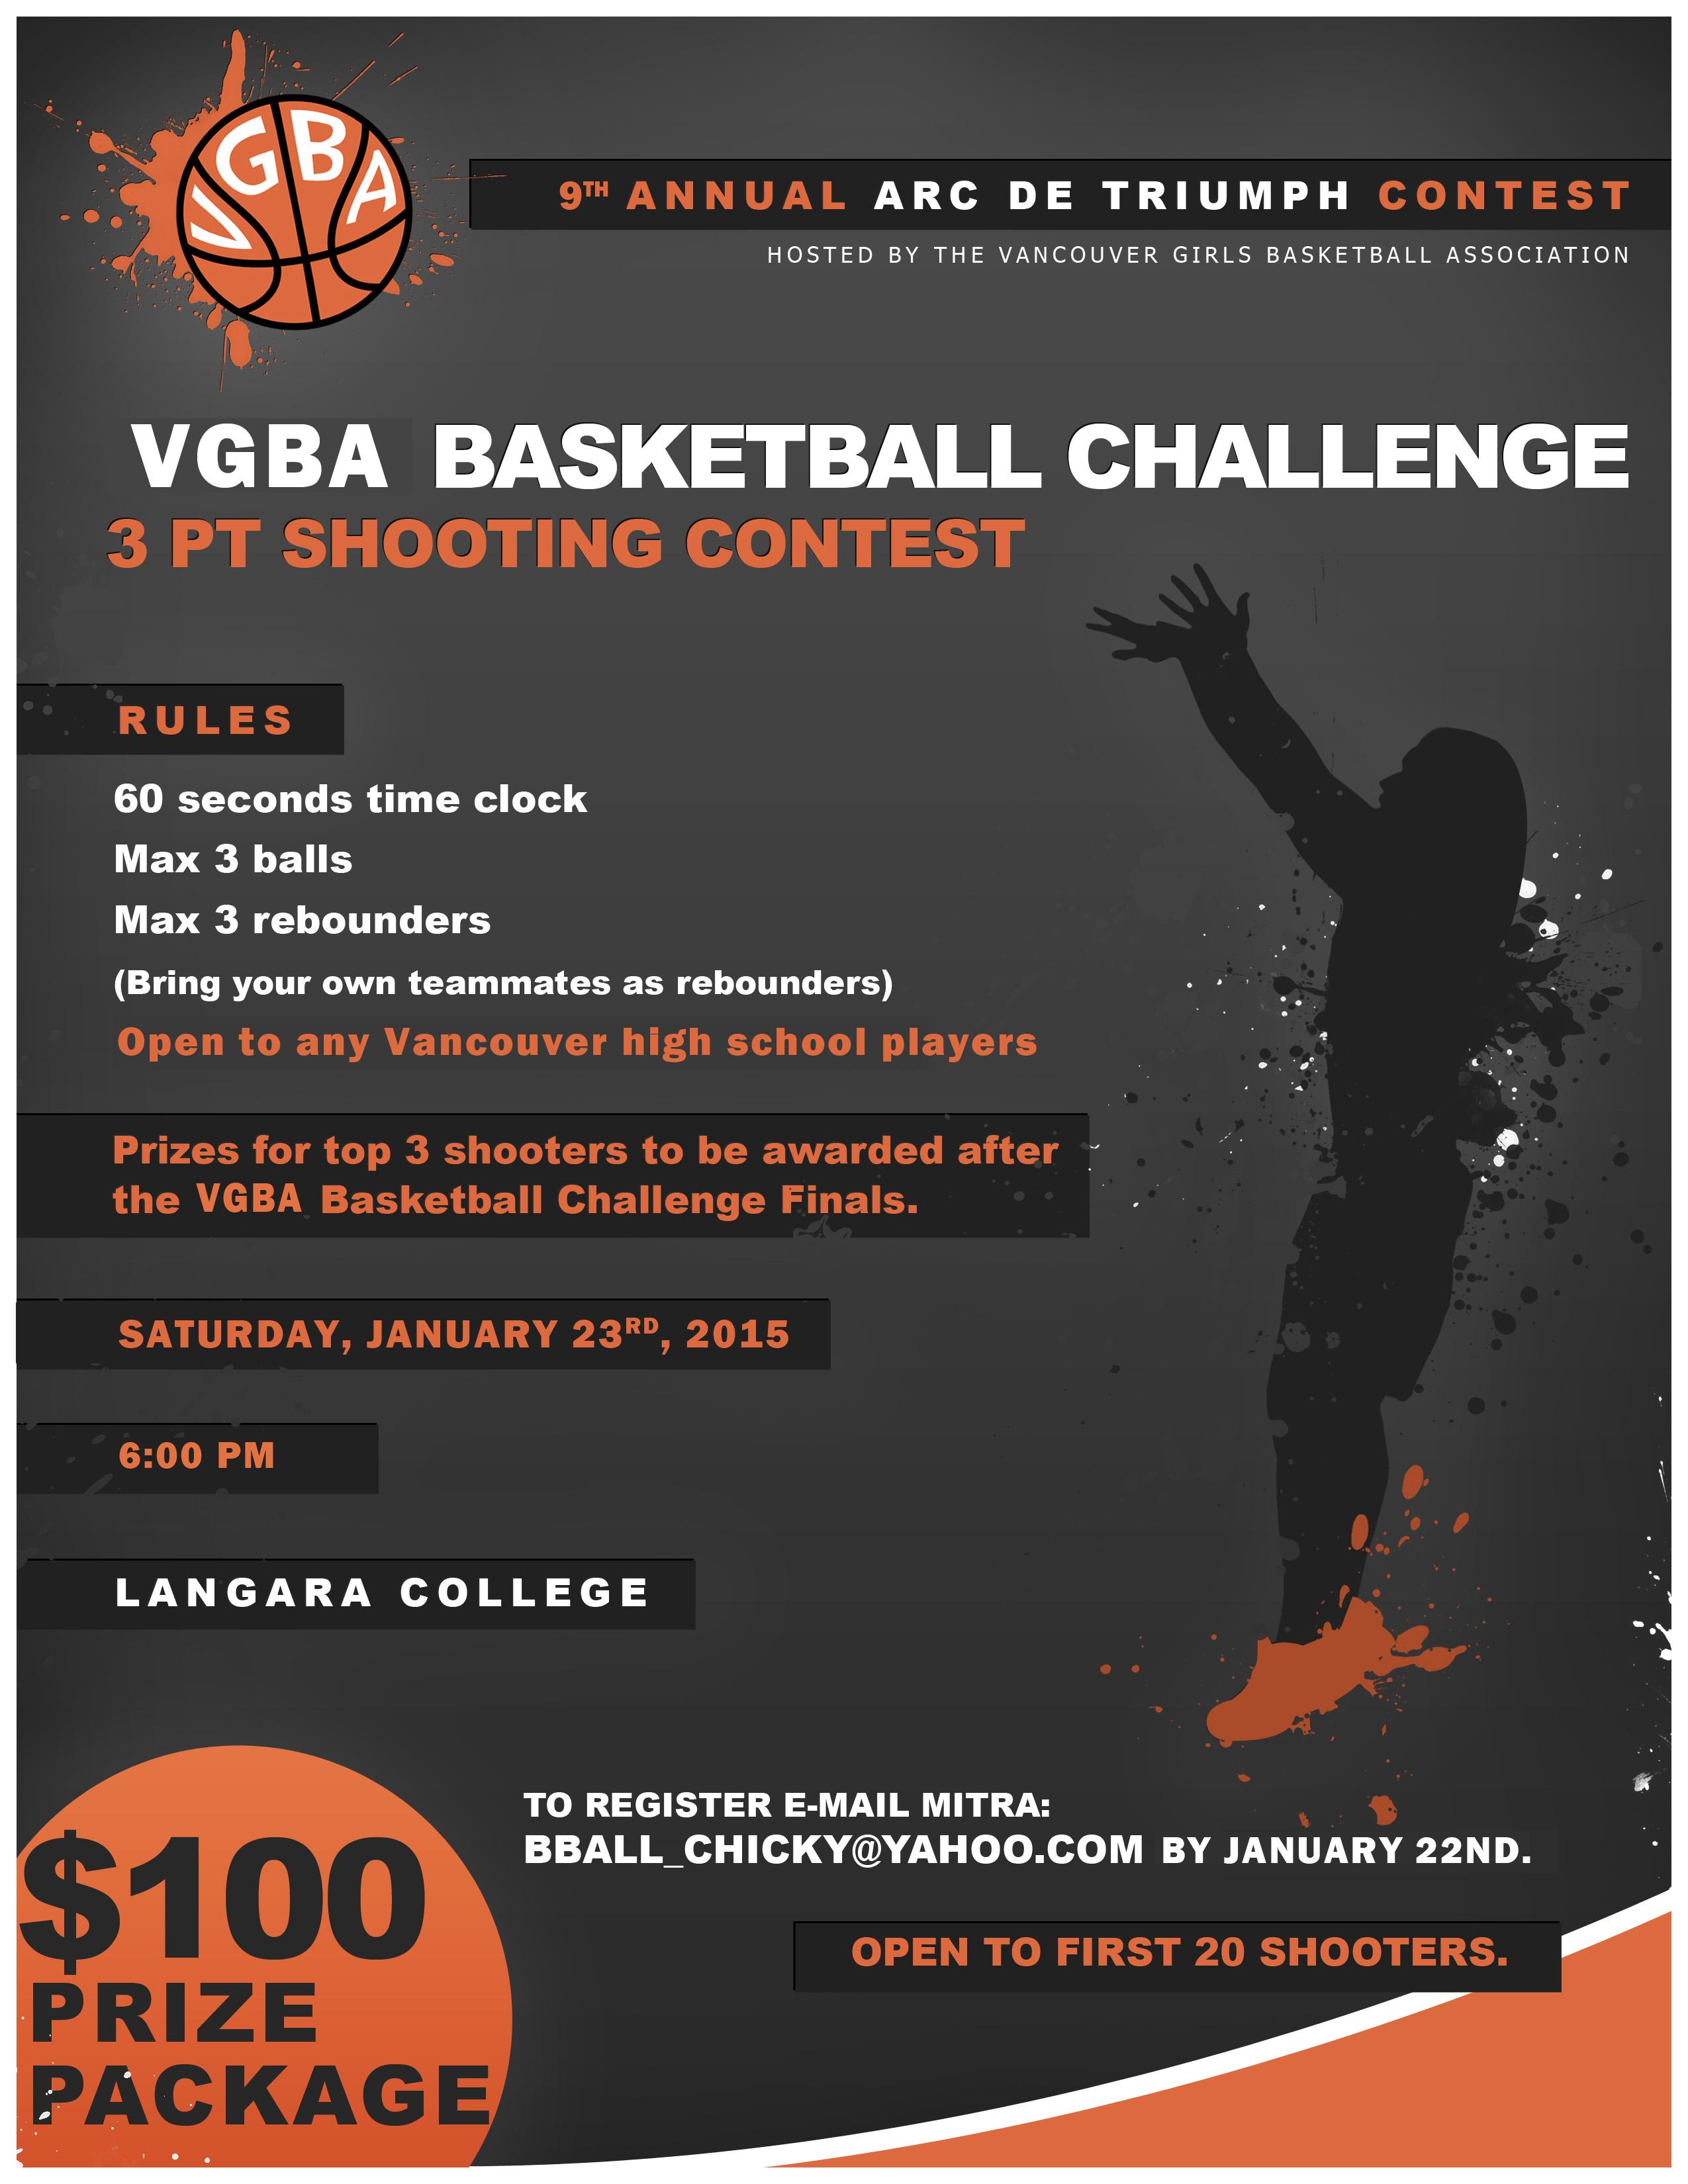 VGBA Langara Challenge 3pt Contest